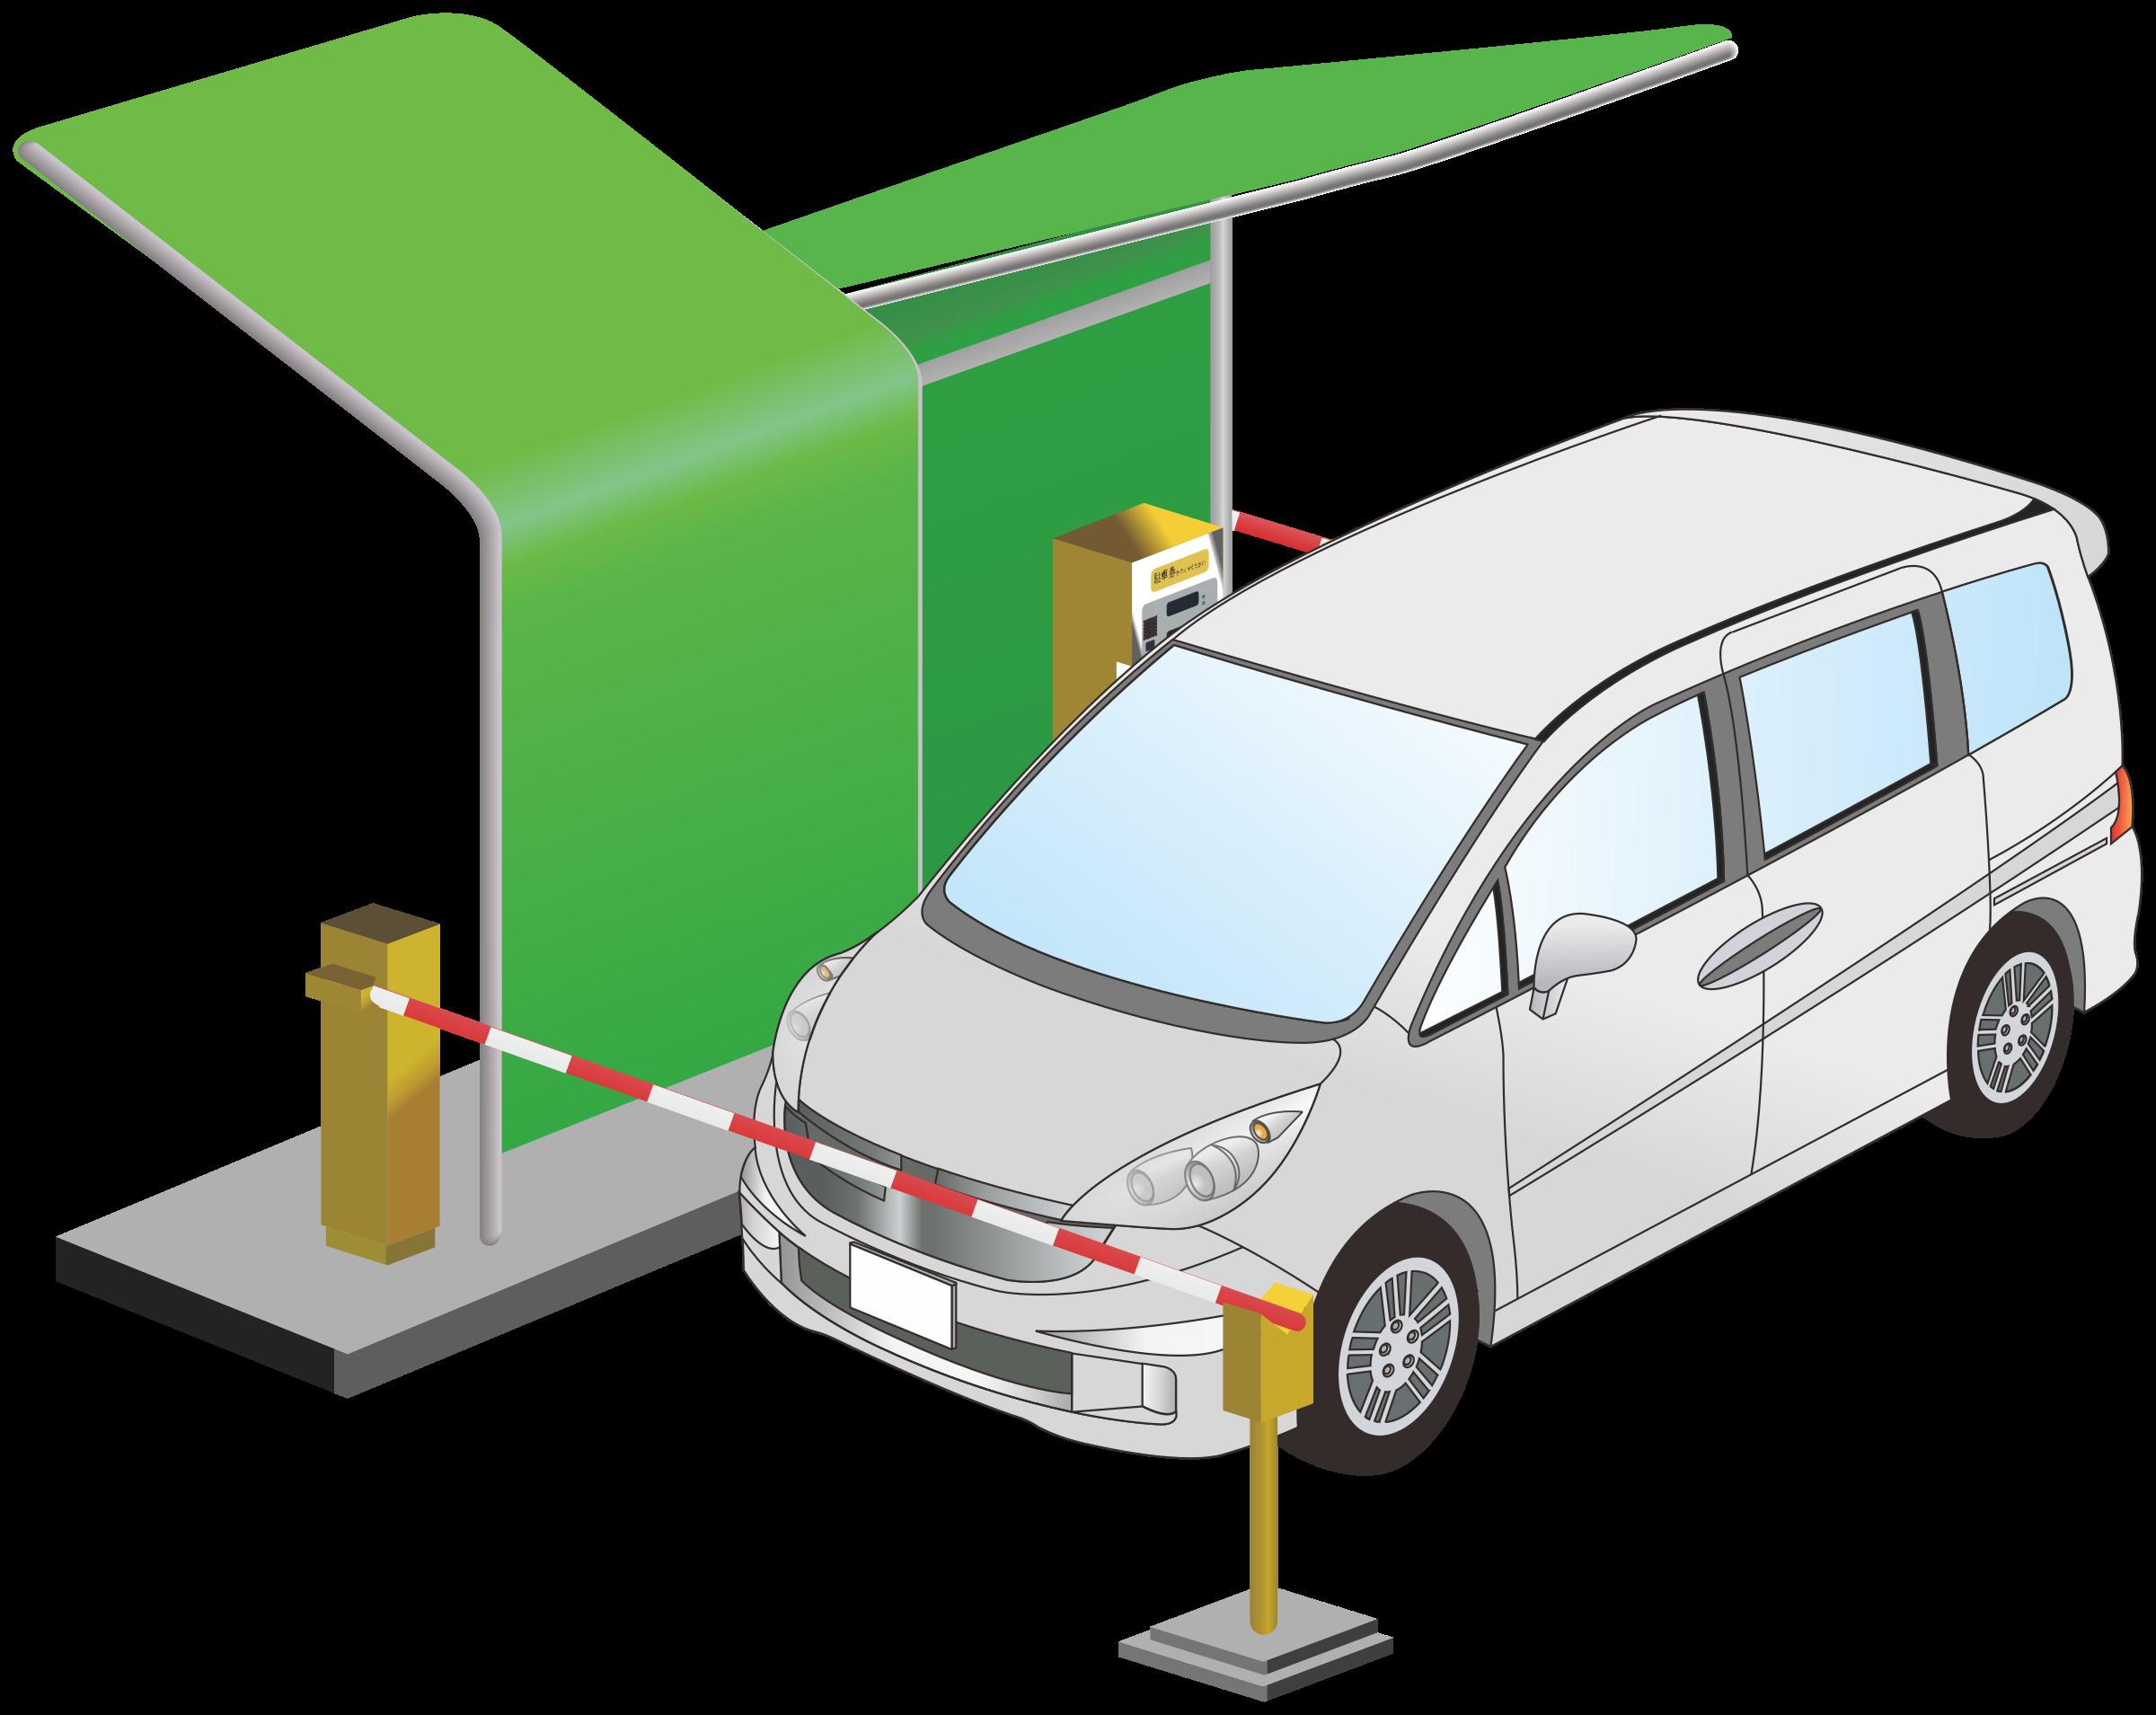 Clipart car parking jpg Clipart - Parking system jpg